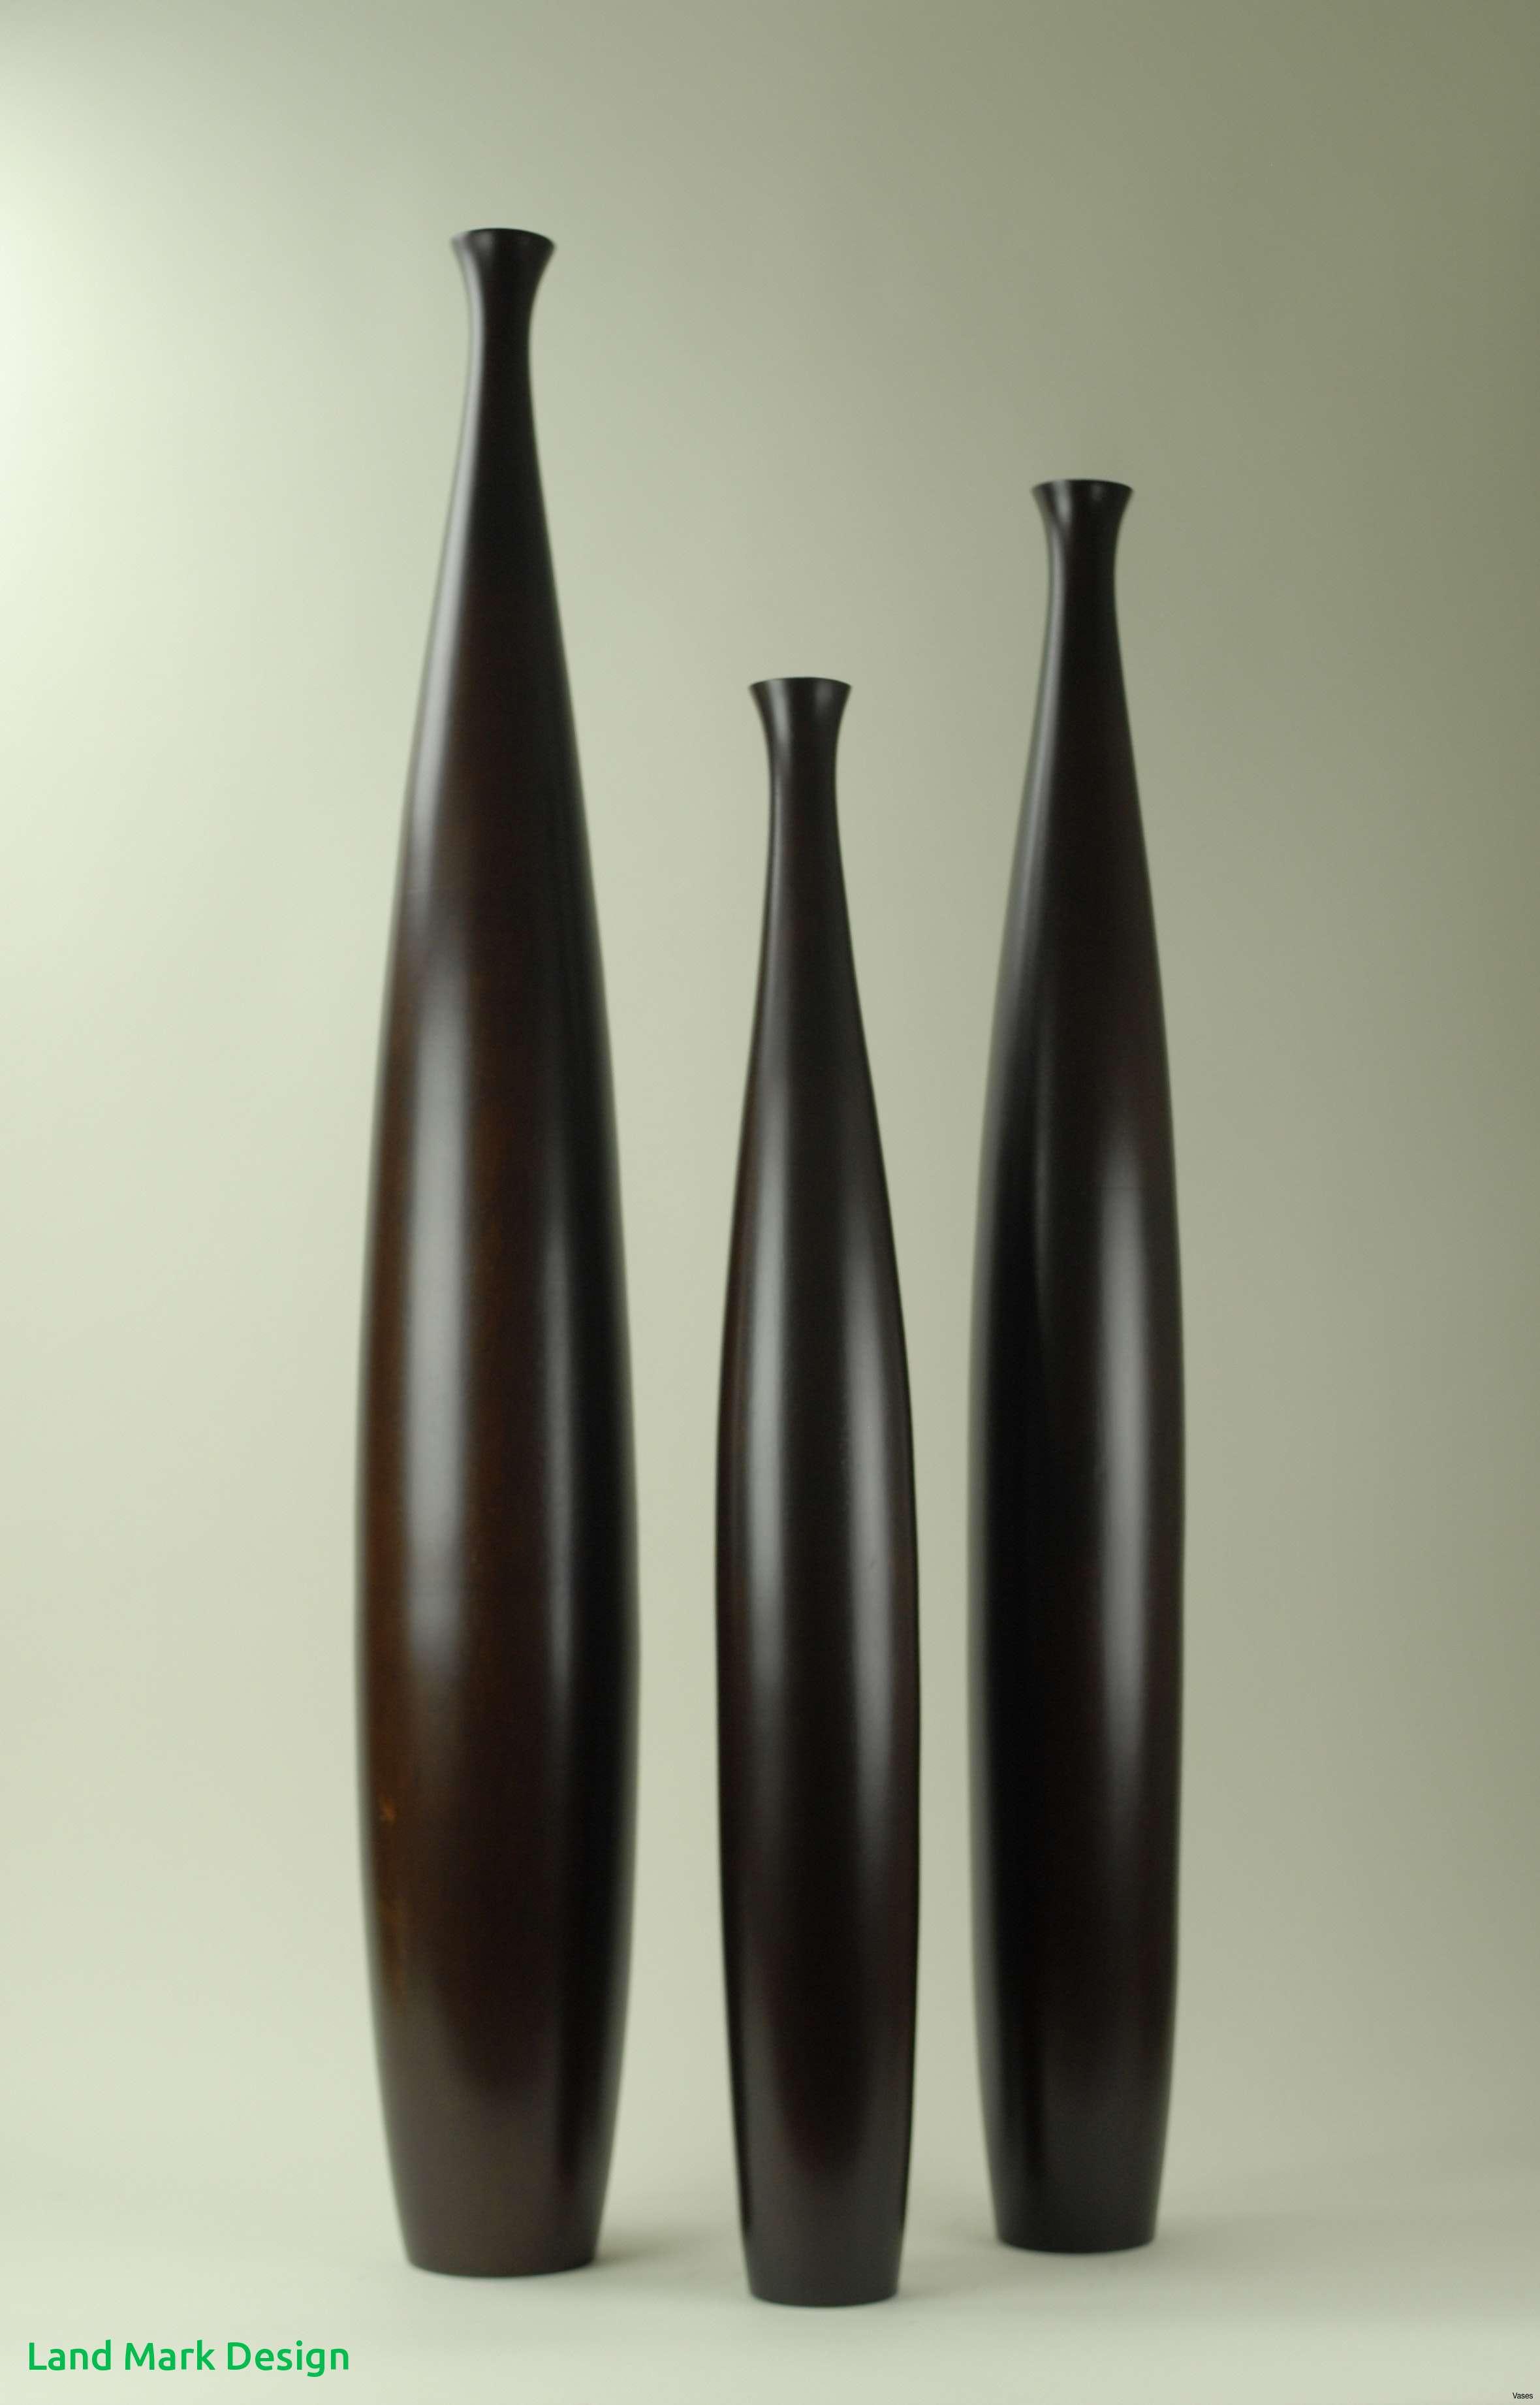 black vases for sale of cheap floor vase home design in interesting black tall floor vase for exciting living room design glass very vases sale cheap decorative